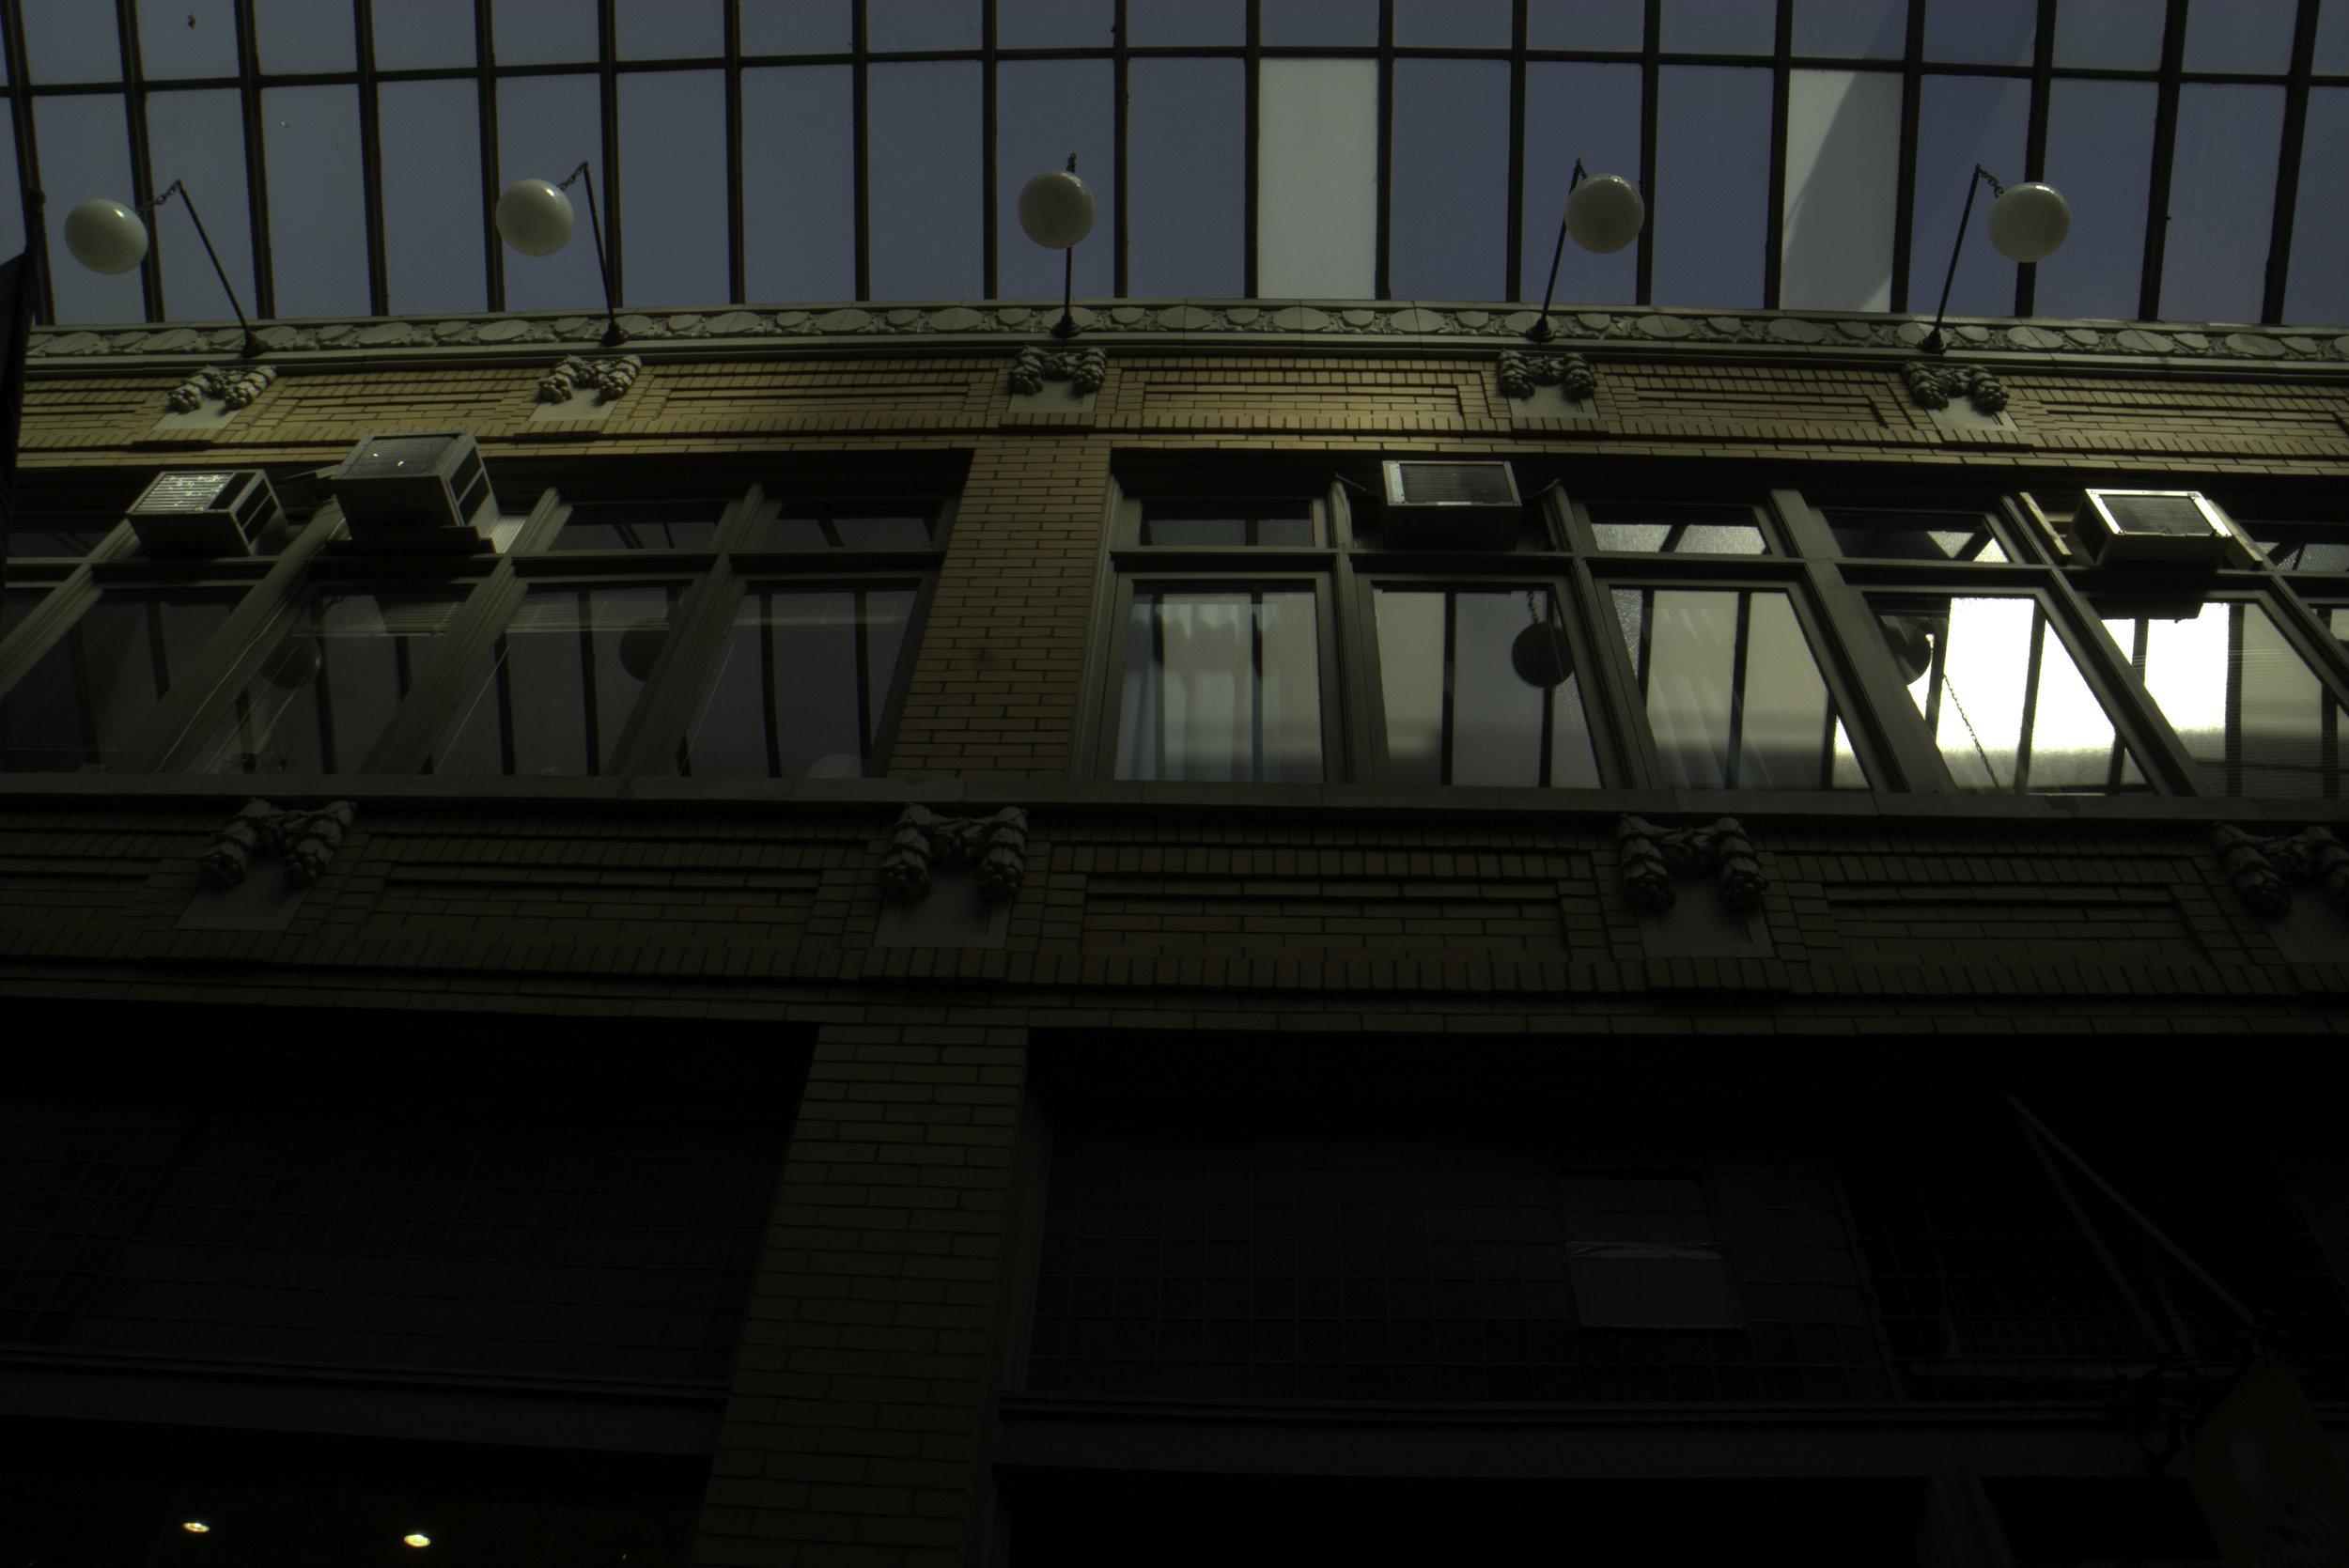 Gallery-store-symmetric-light-Ann-Arbor-Michigan.jpg